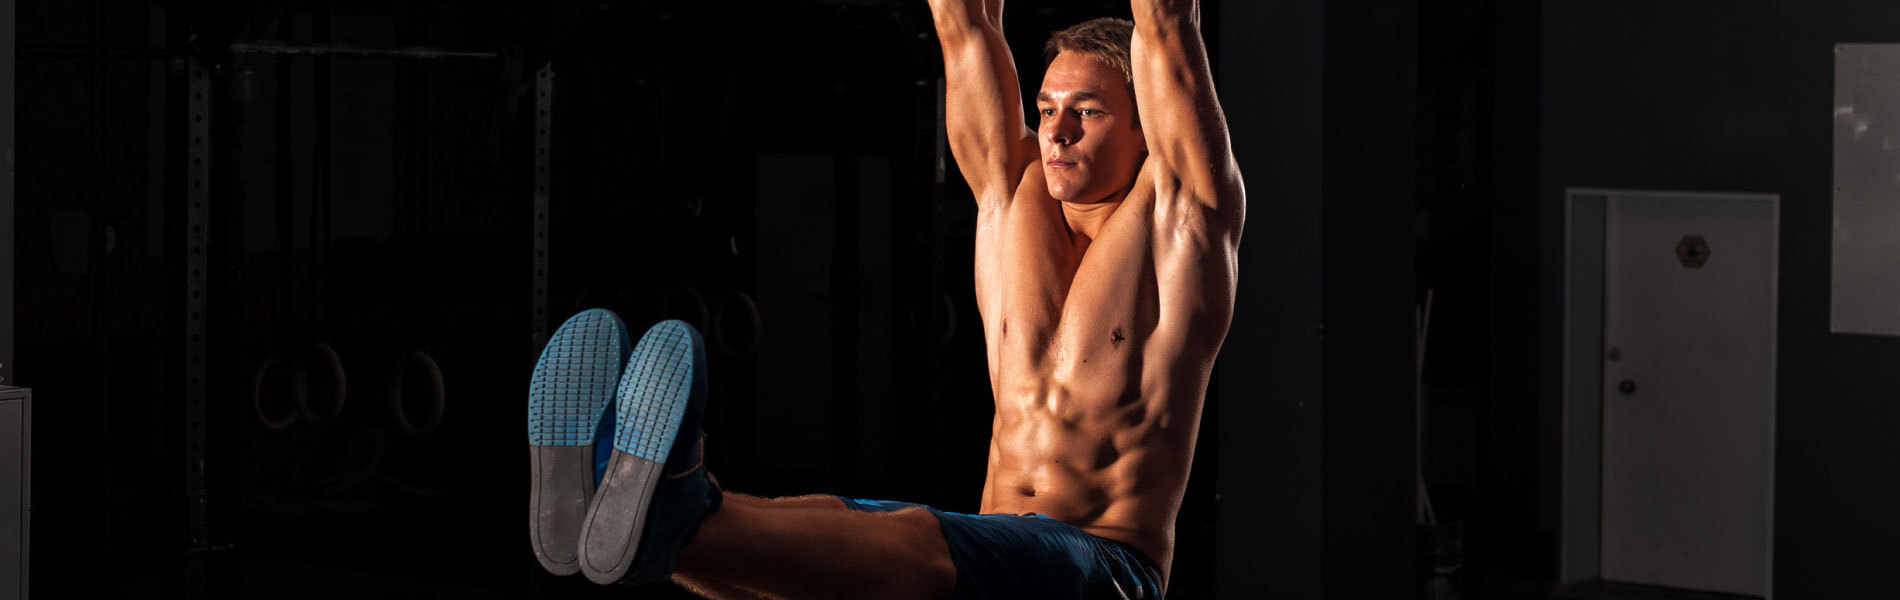 How_Gymnastics_Can_Increase_Martial_Arts_Performance_1900x600.jpg